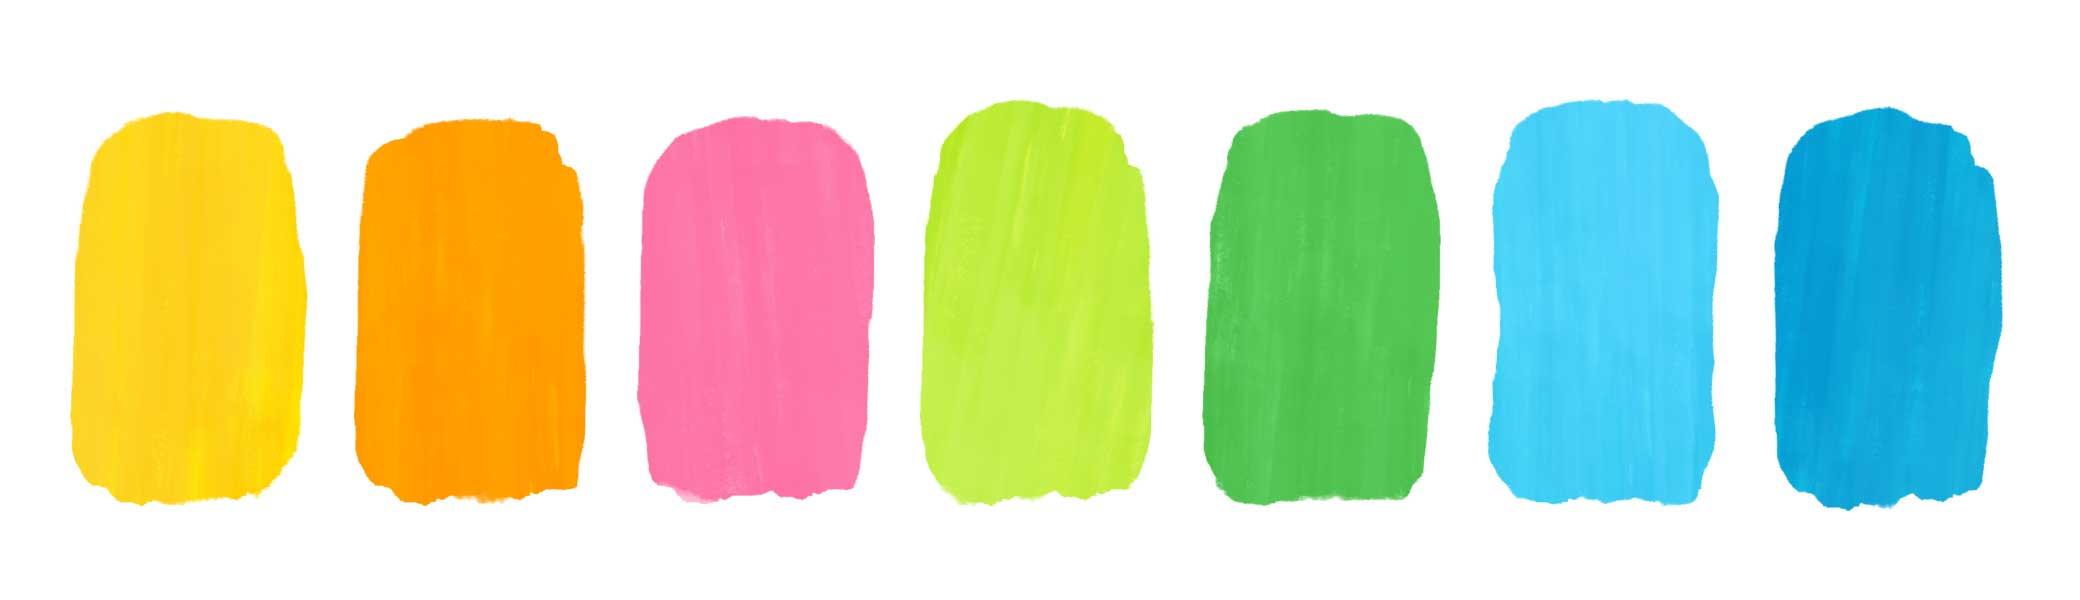 colors_2080x3